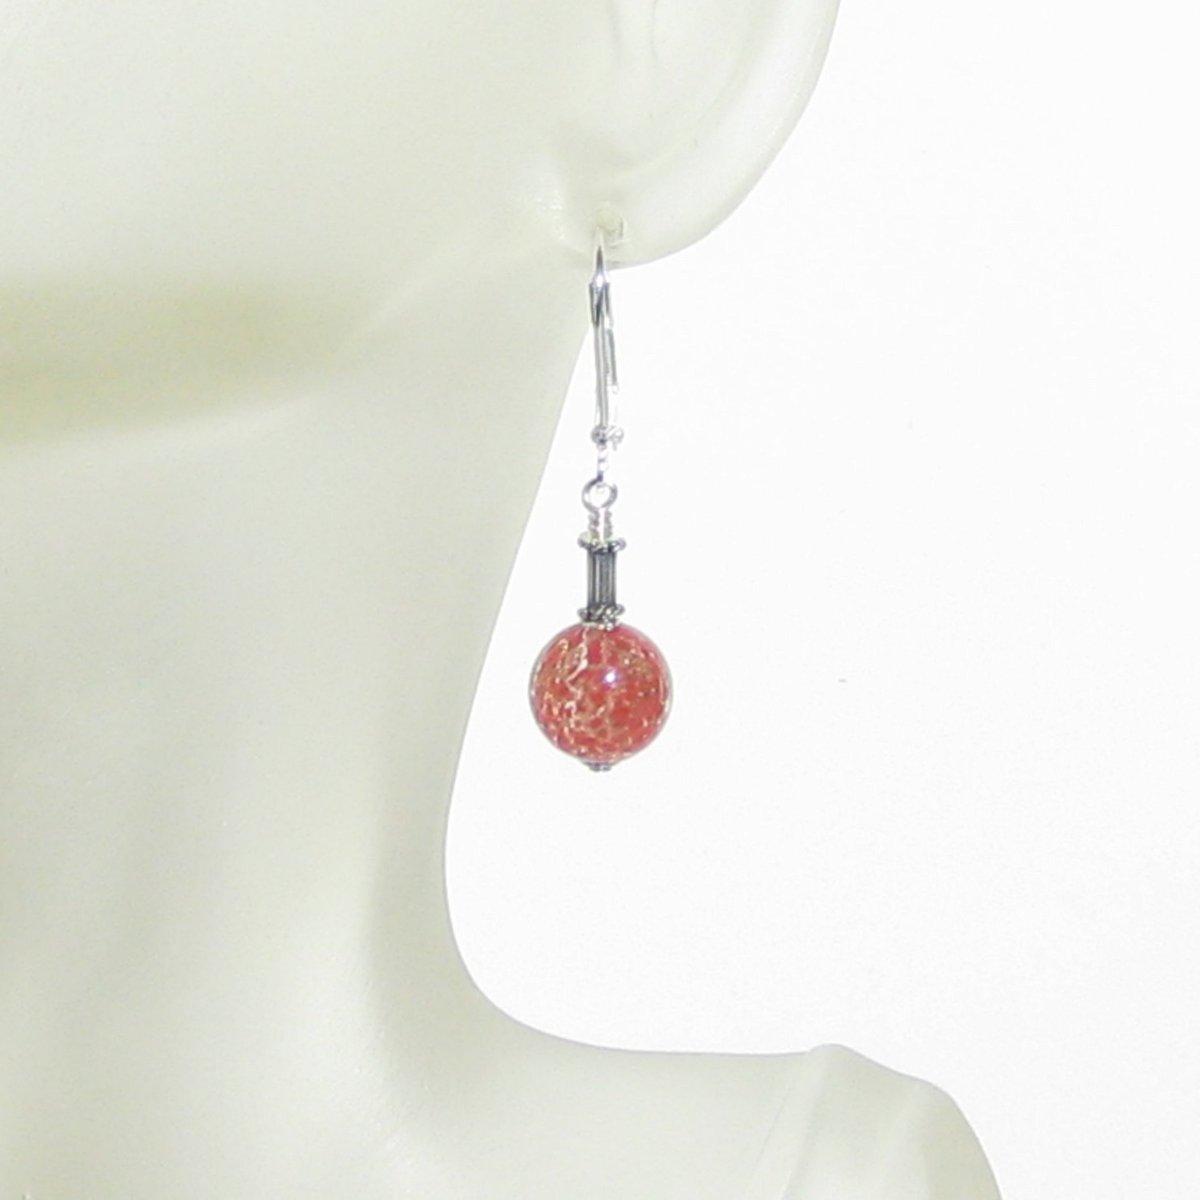 Murano Glass Red Ball Tube Dangle Silver Earrings  #handmade #fashion #earrings #etsymntt #jewelry #murano